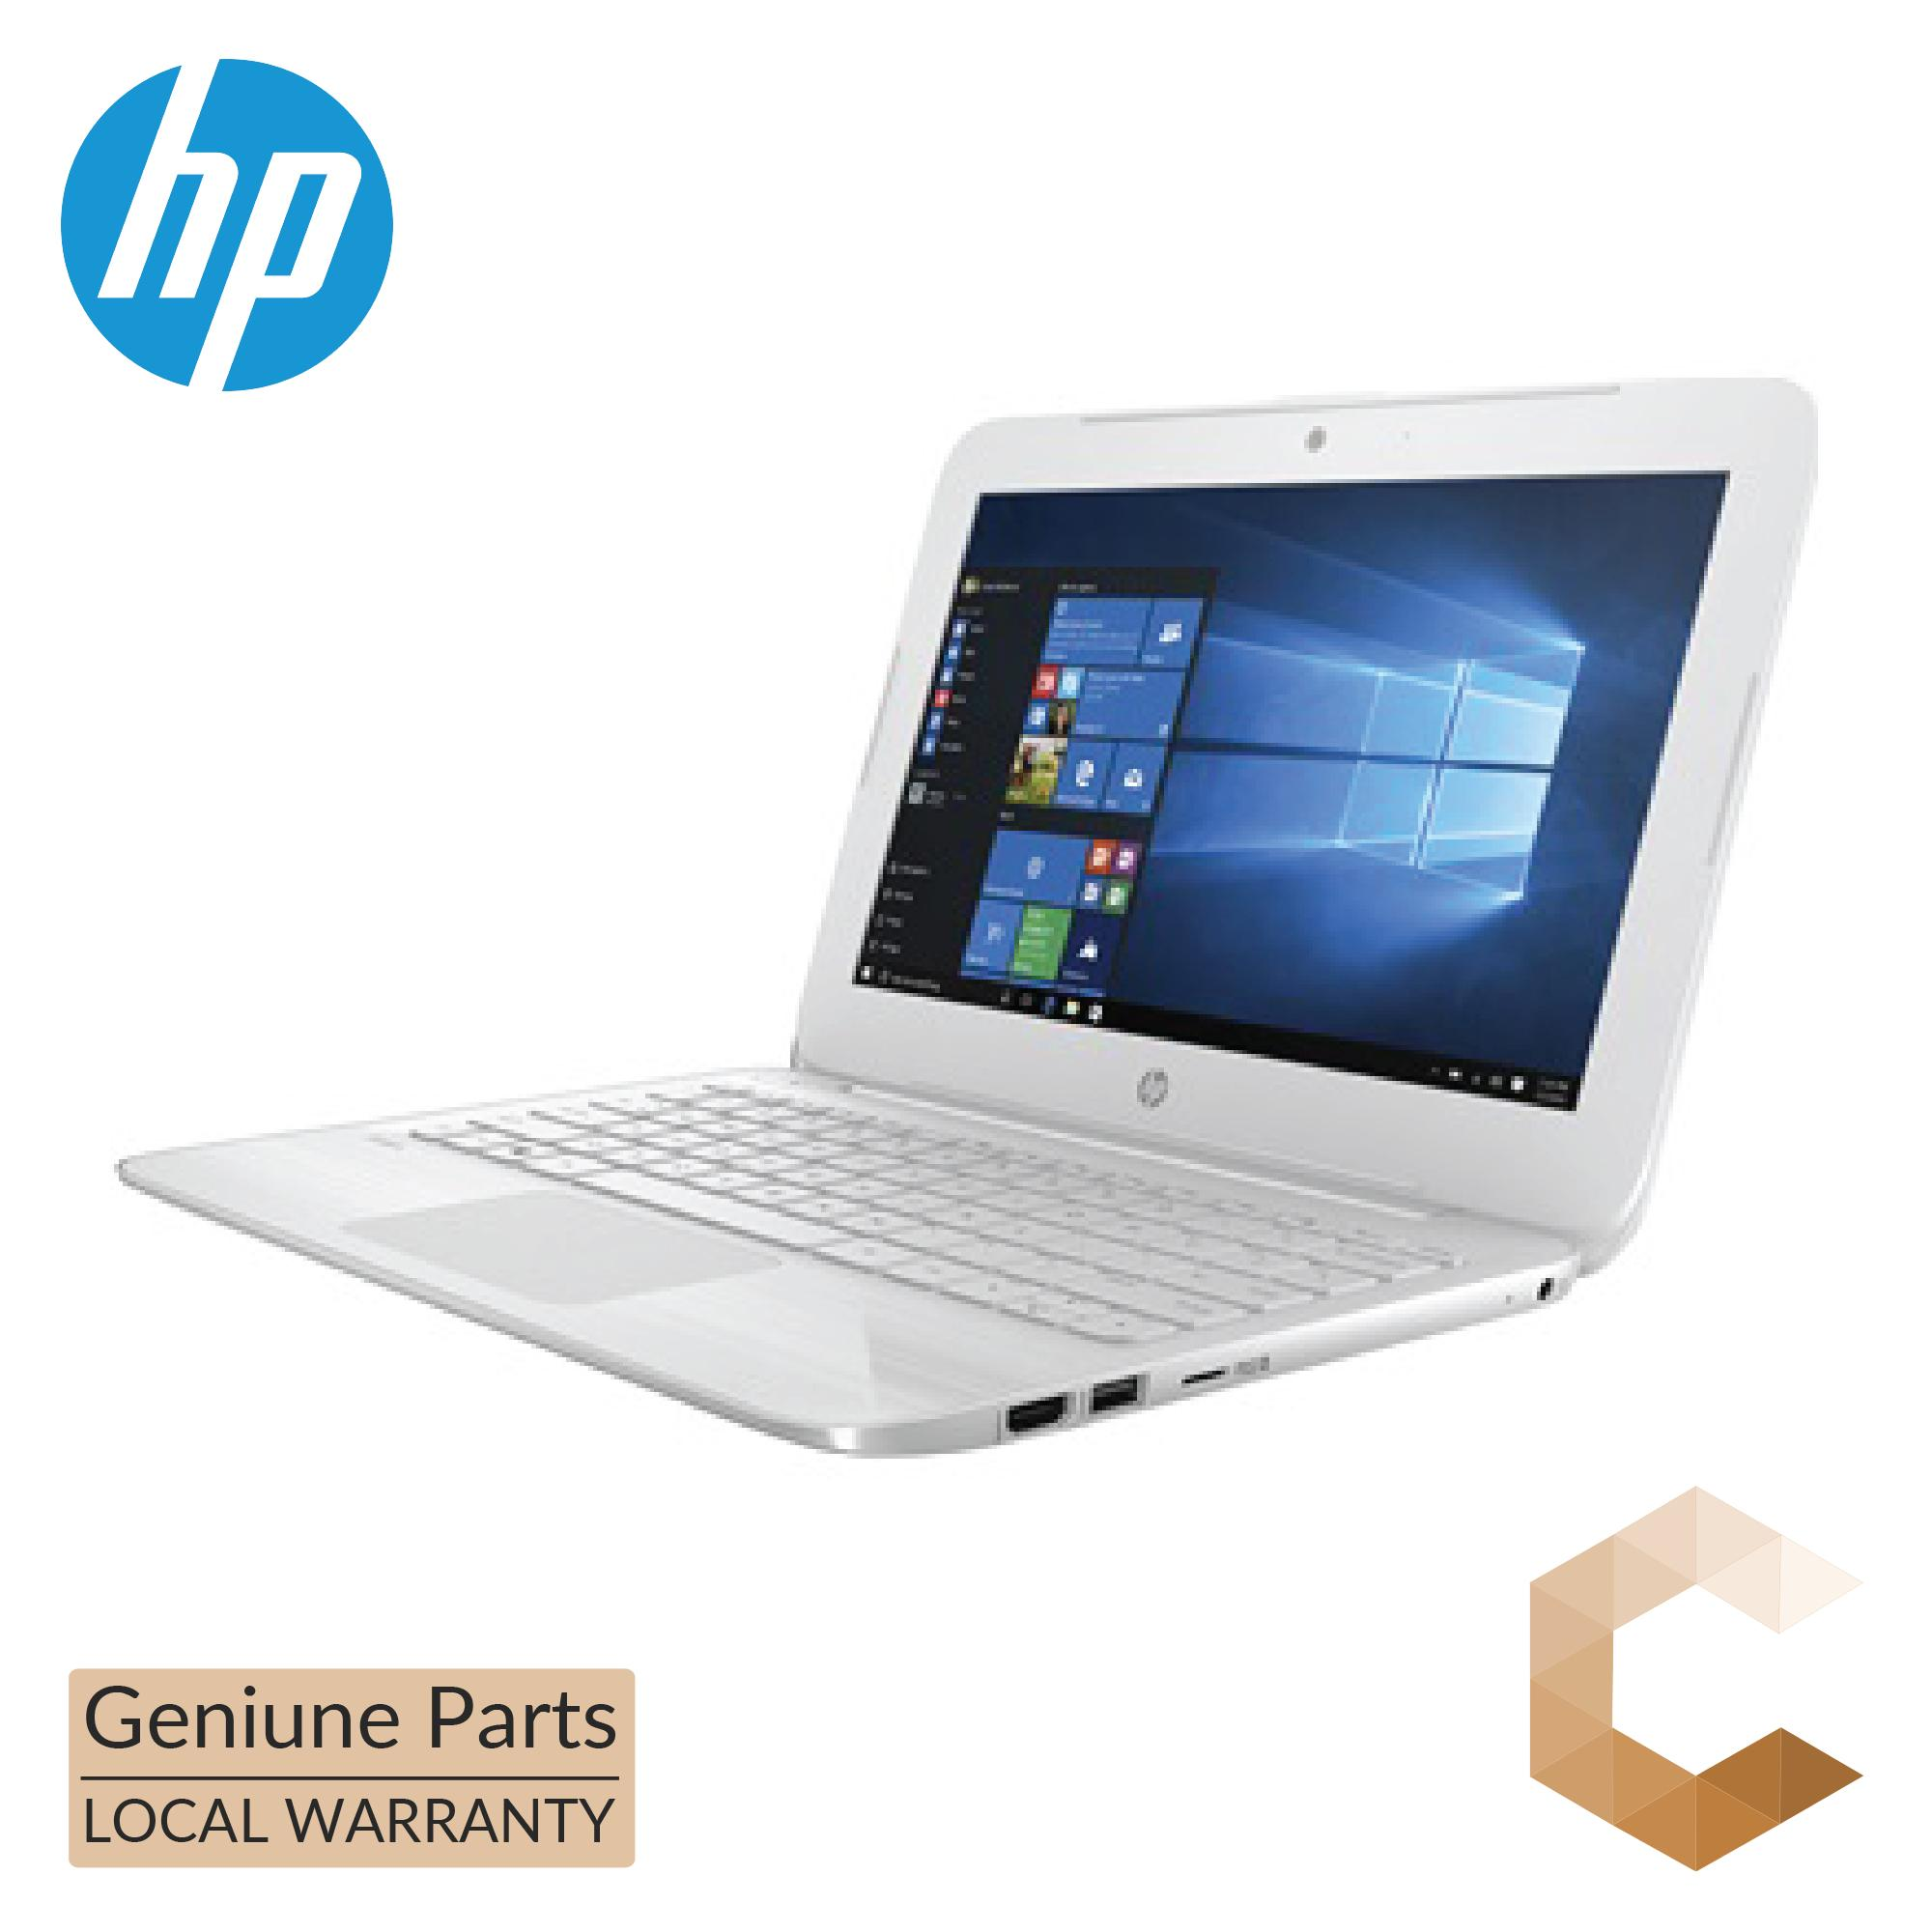 HP Stream Laptop 11-ah106TU (4NL35PA) | Lazada Singapore